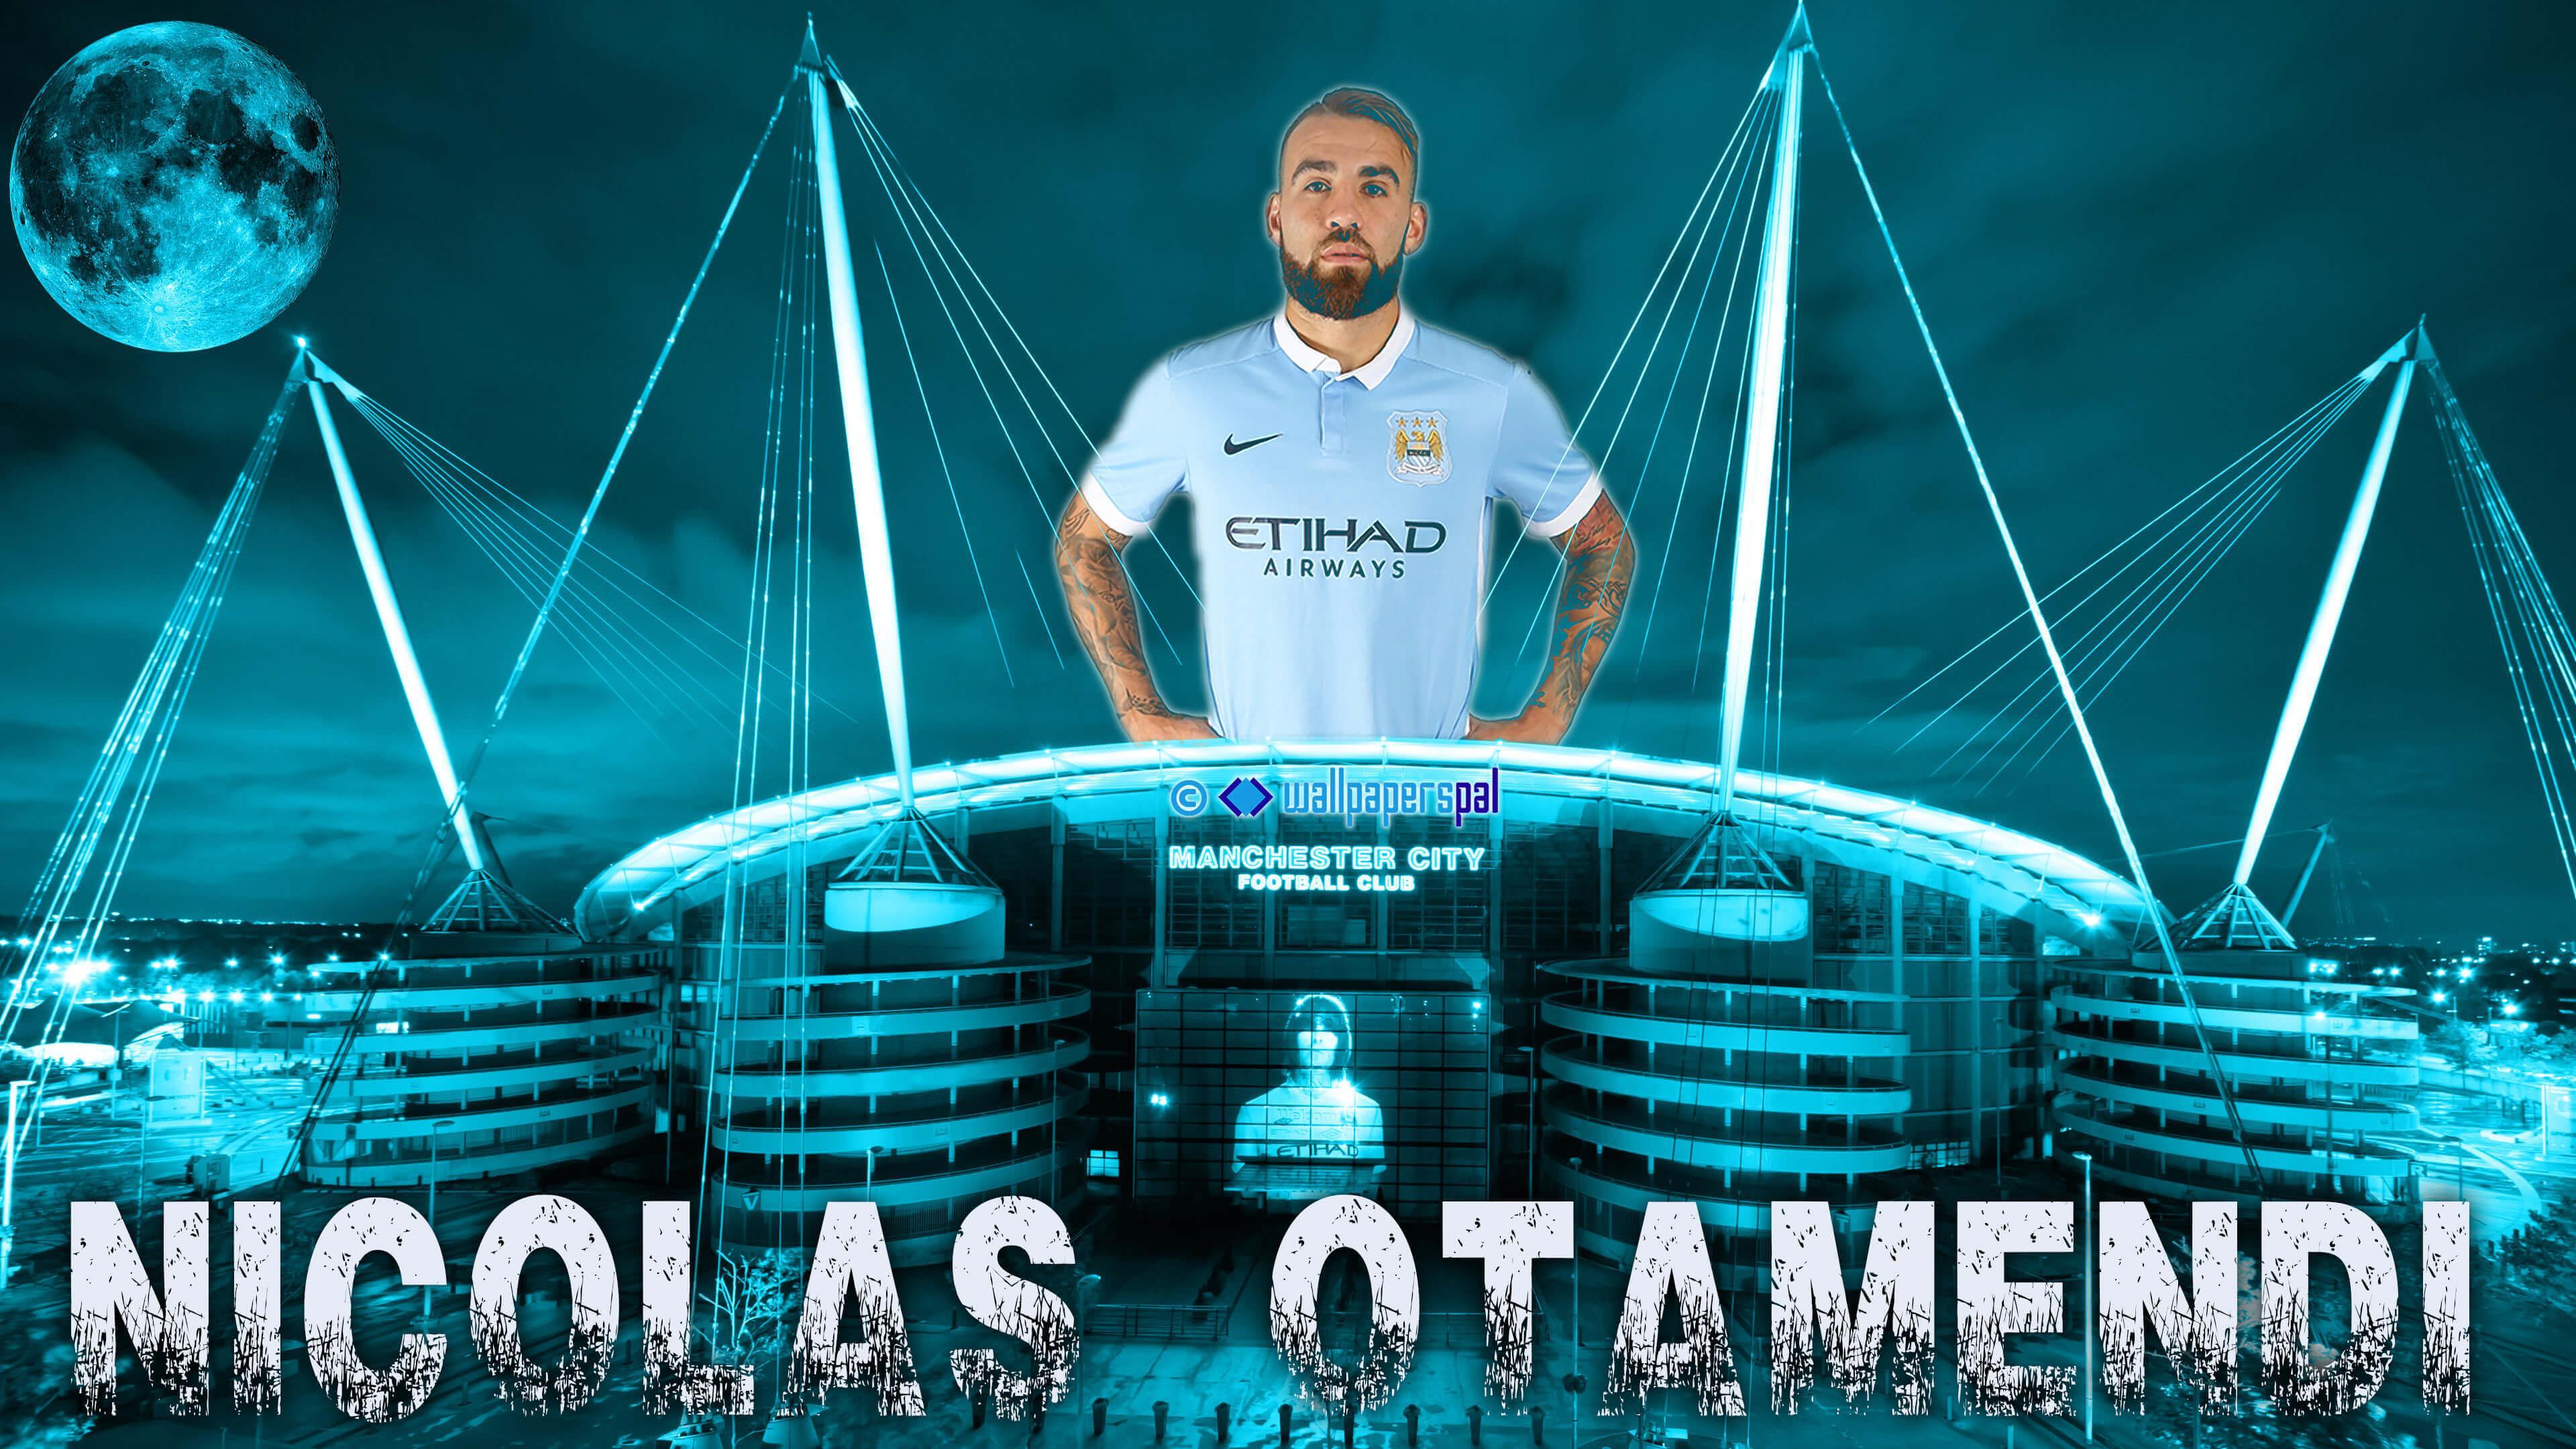 والپیپر: Nicolás Otamendi